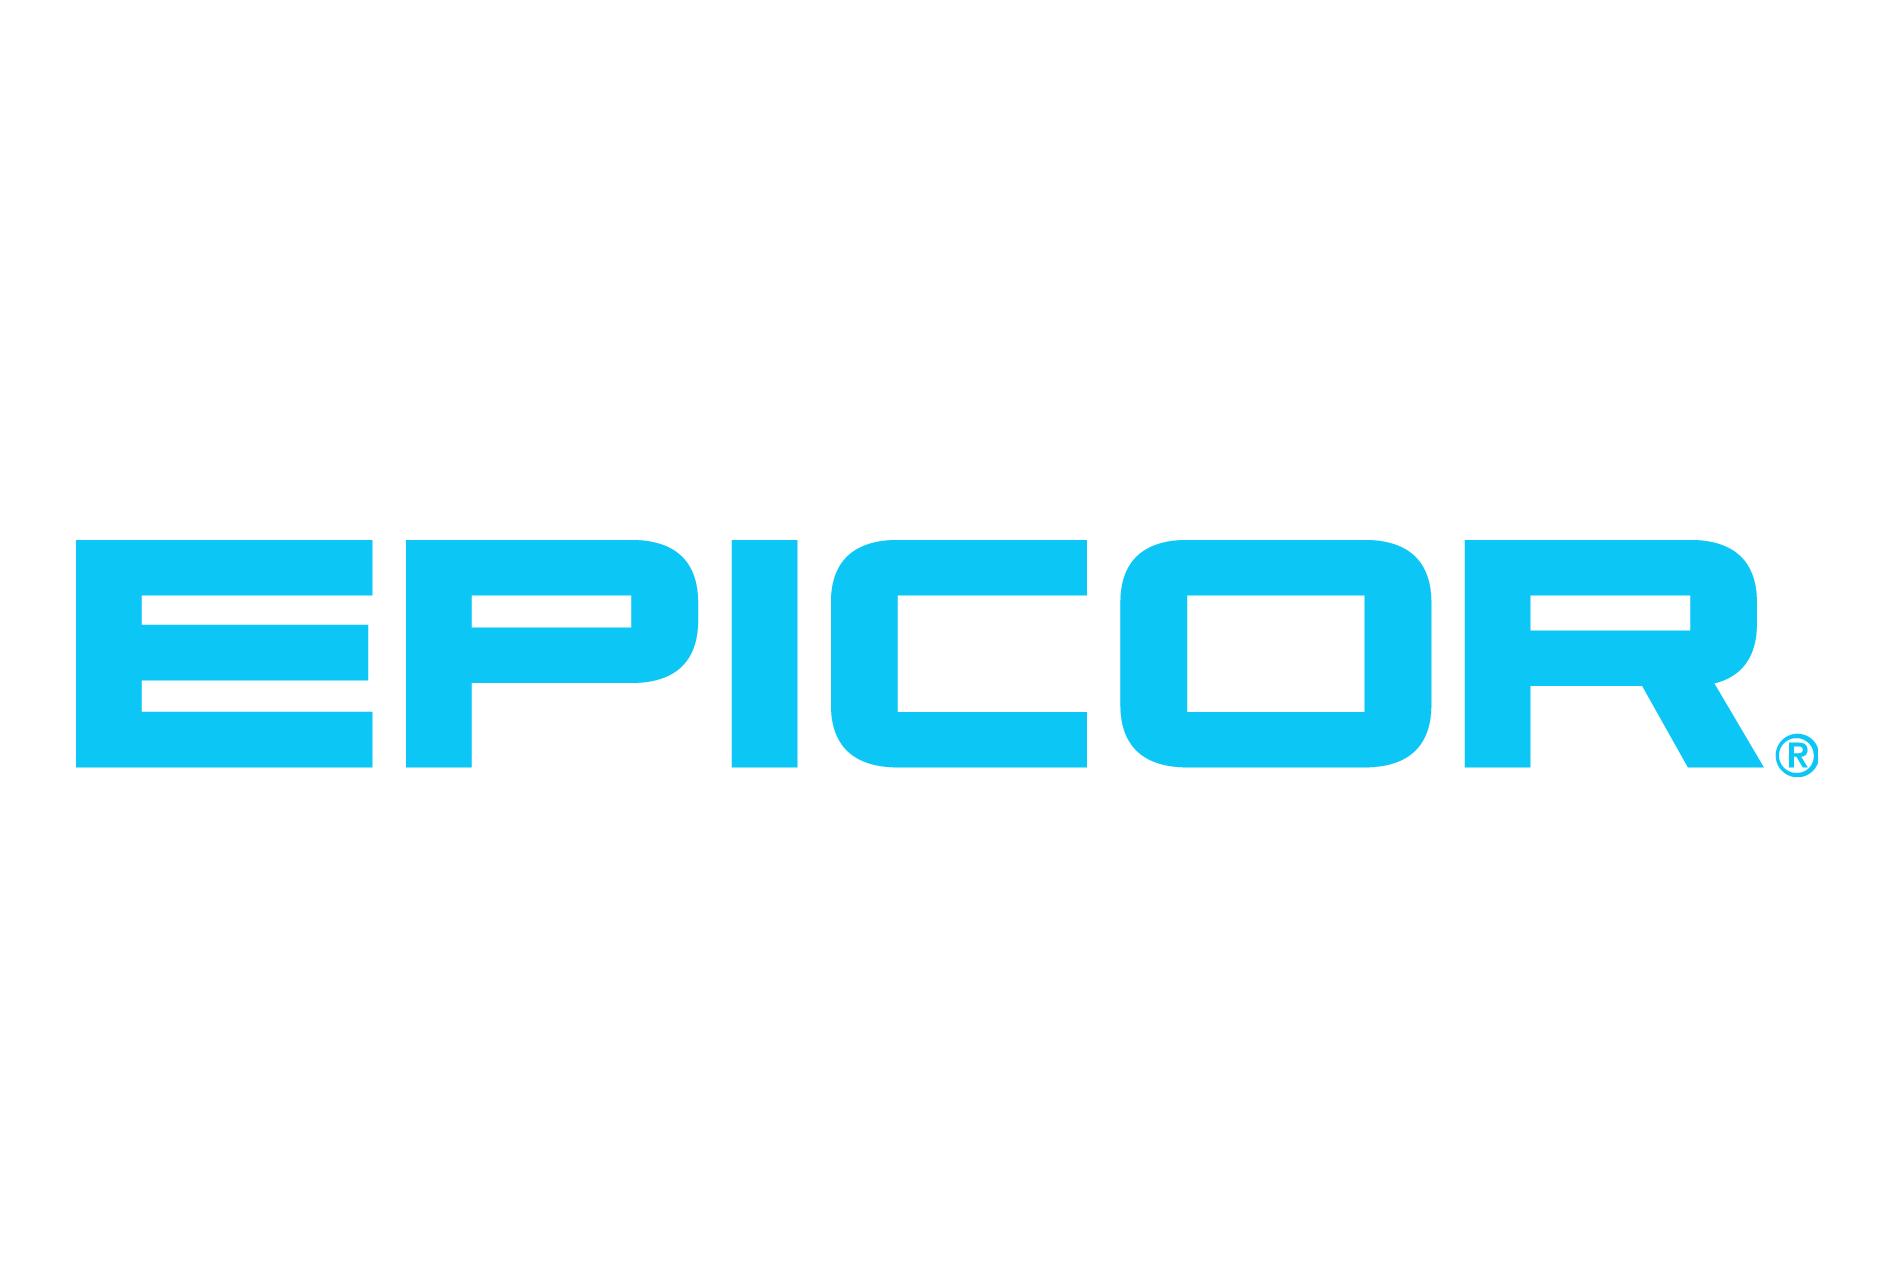 Epicor iScala ERP